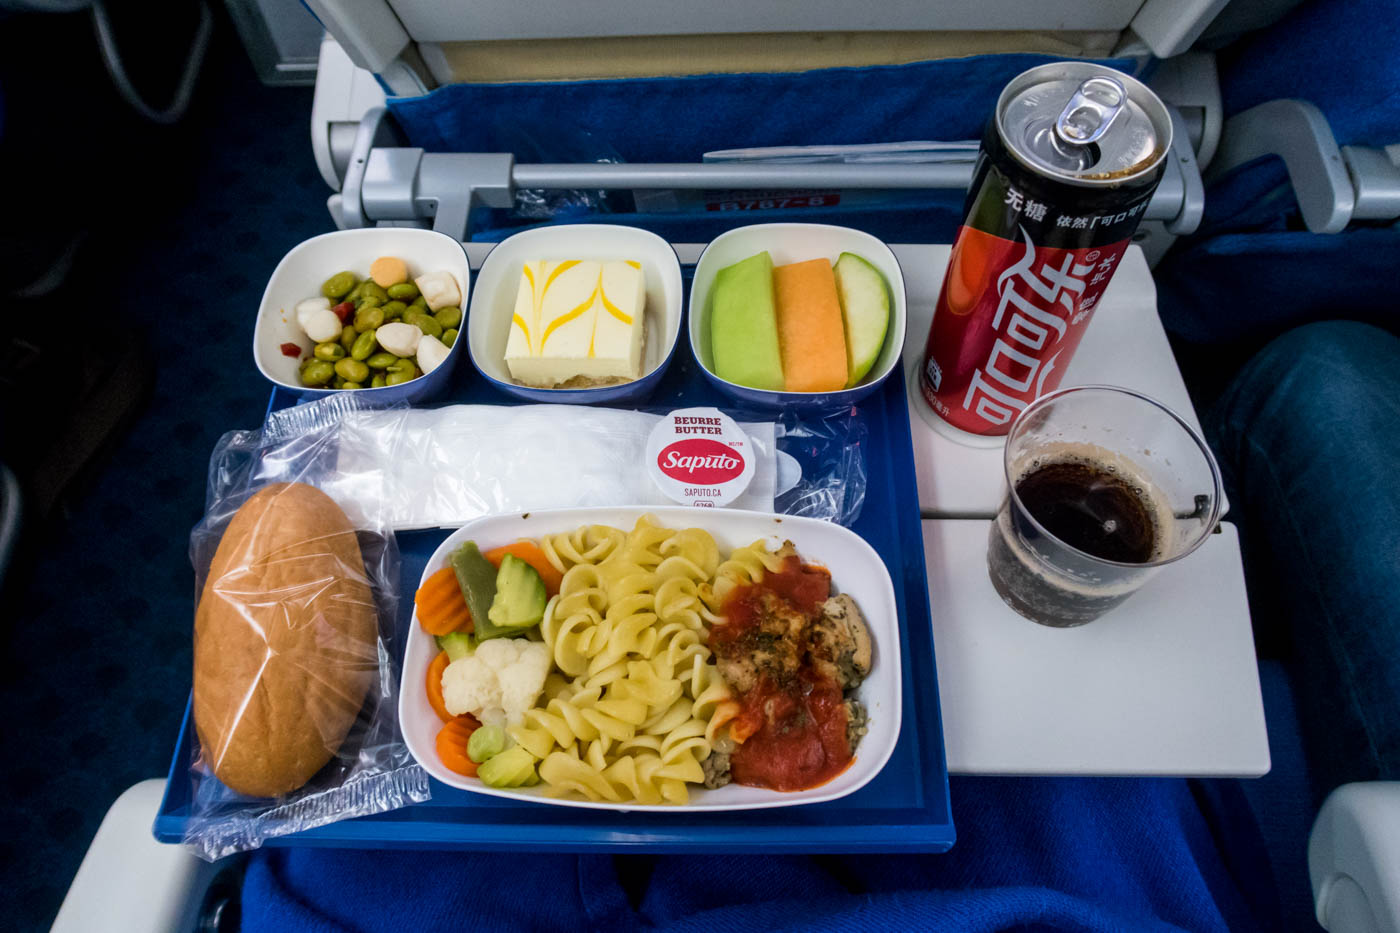 Xiamen Air Economy Class Meal